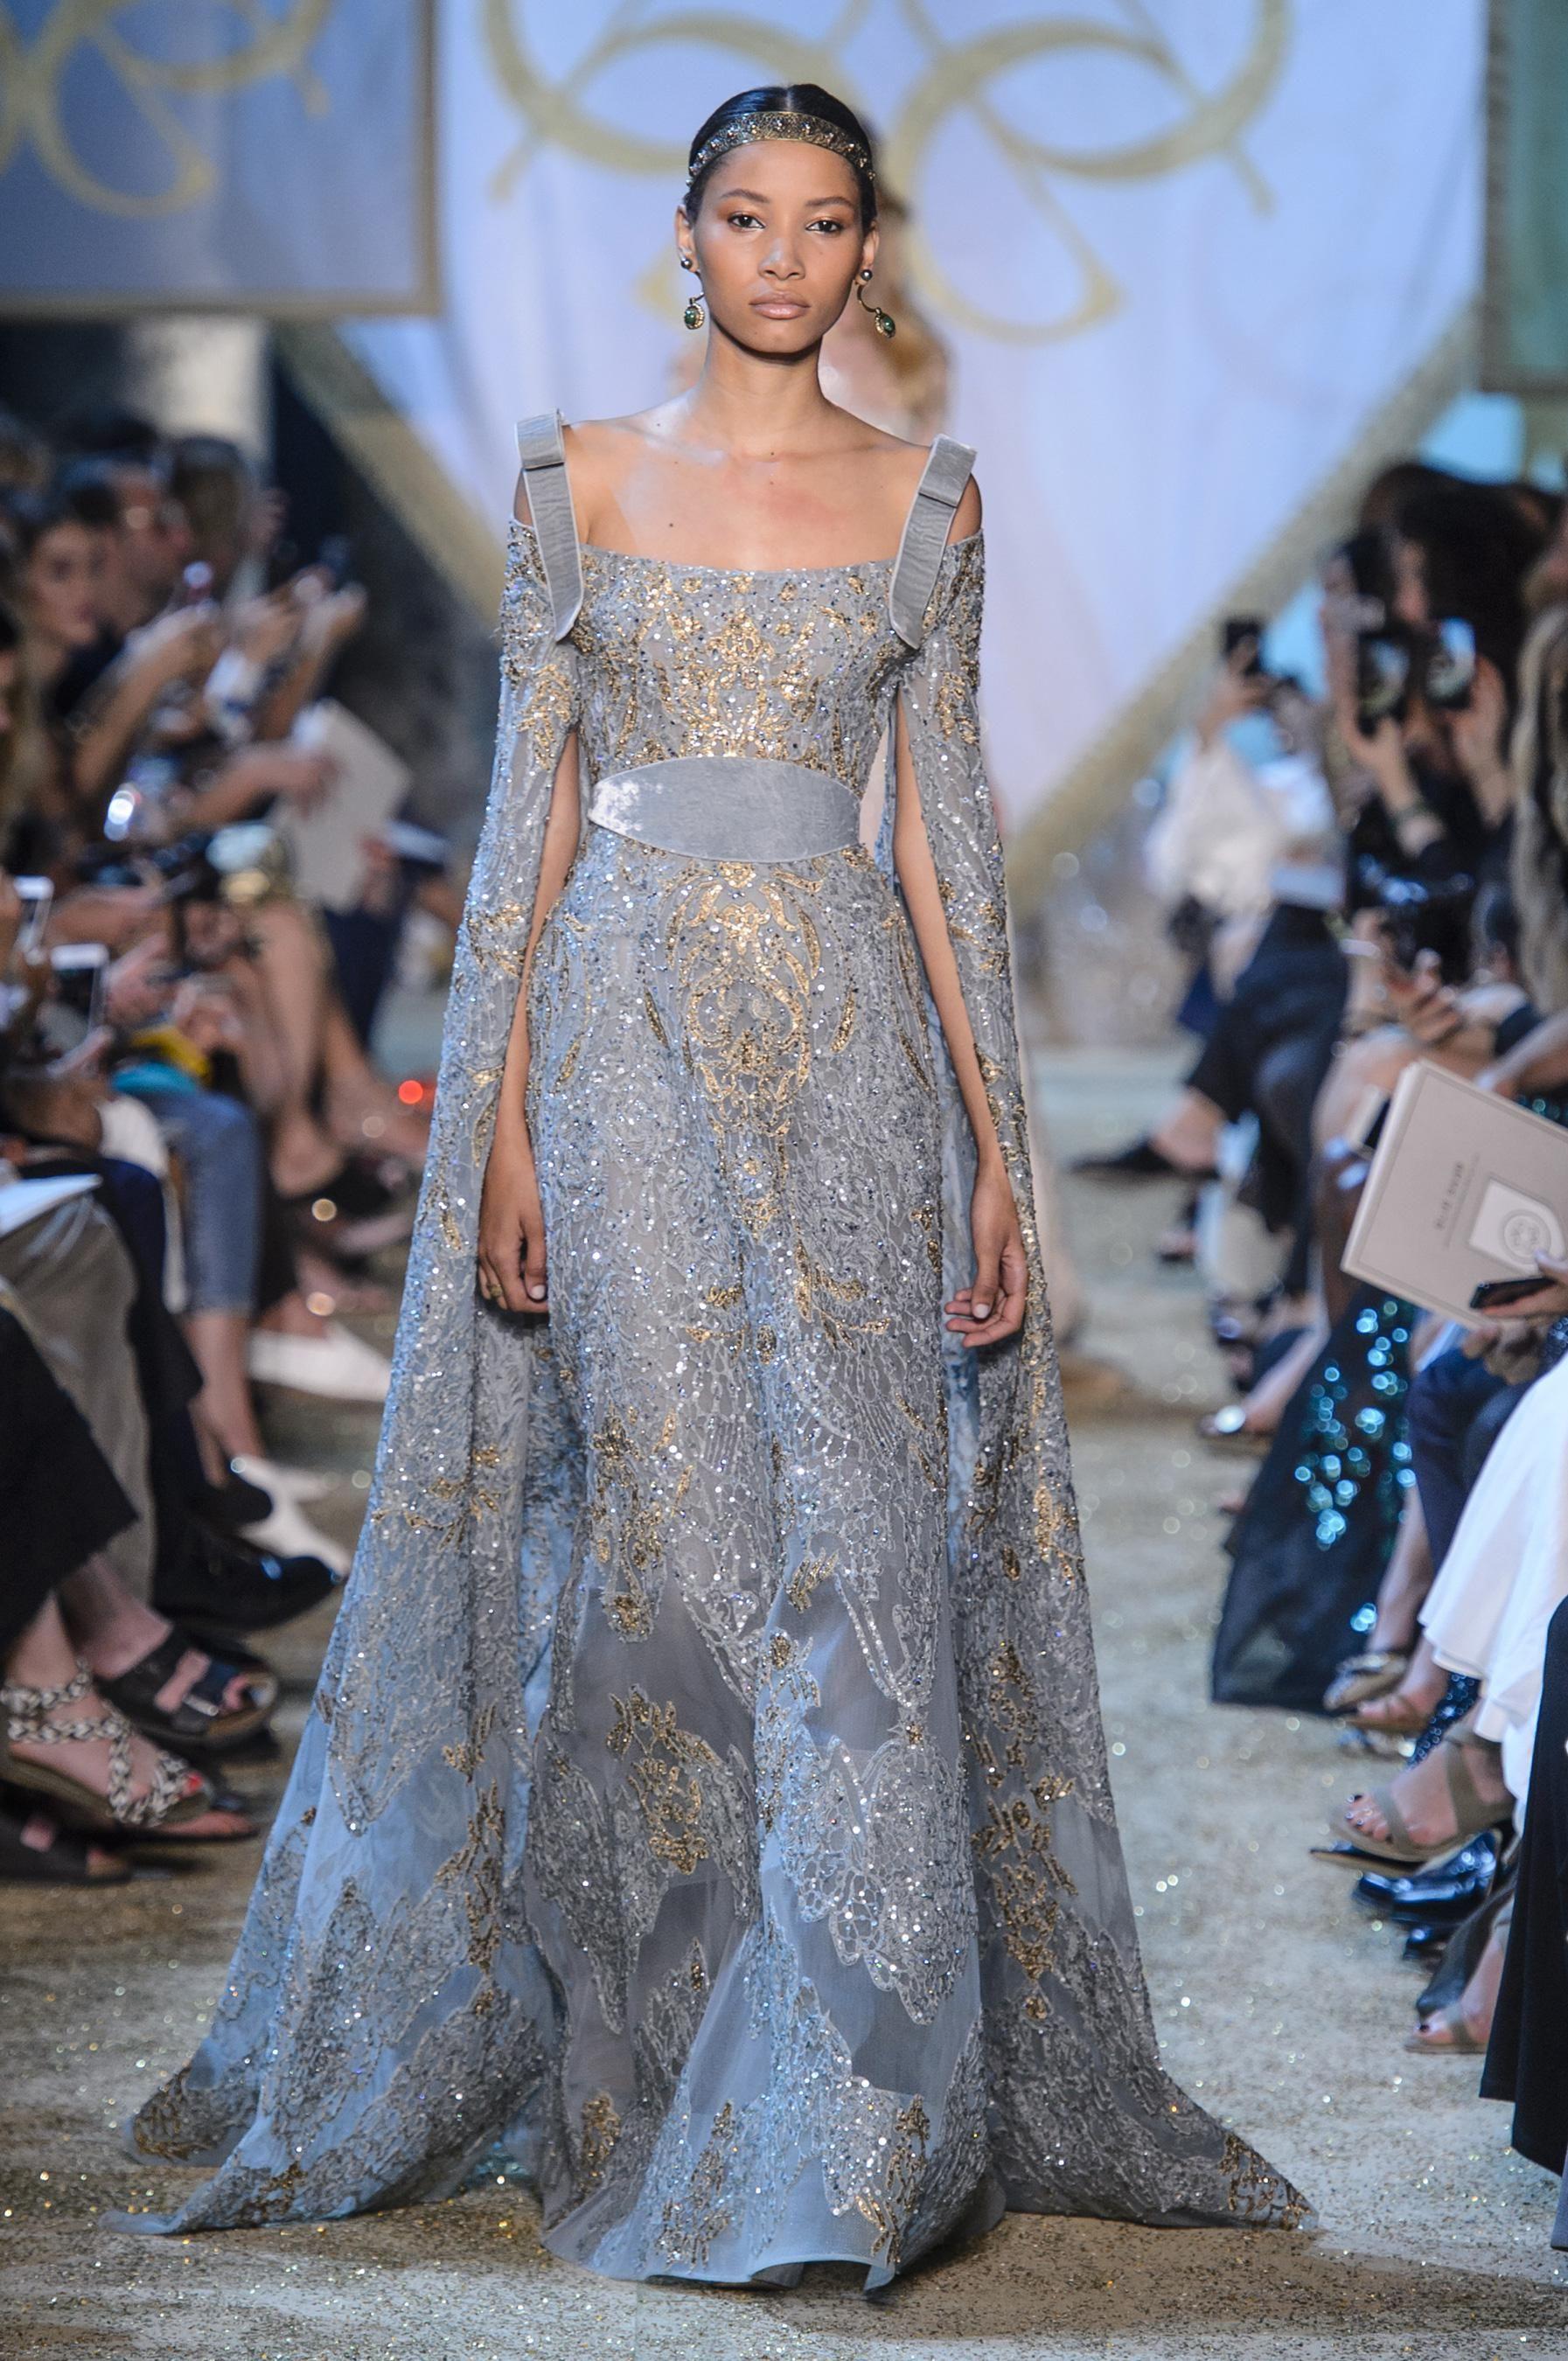 b7a2e2eebd720 Défilé Elie Saab Automne-hiver 2017-2018 Couture | fashion world ...